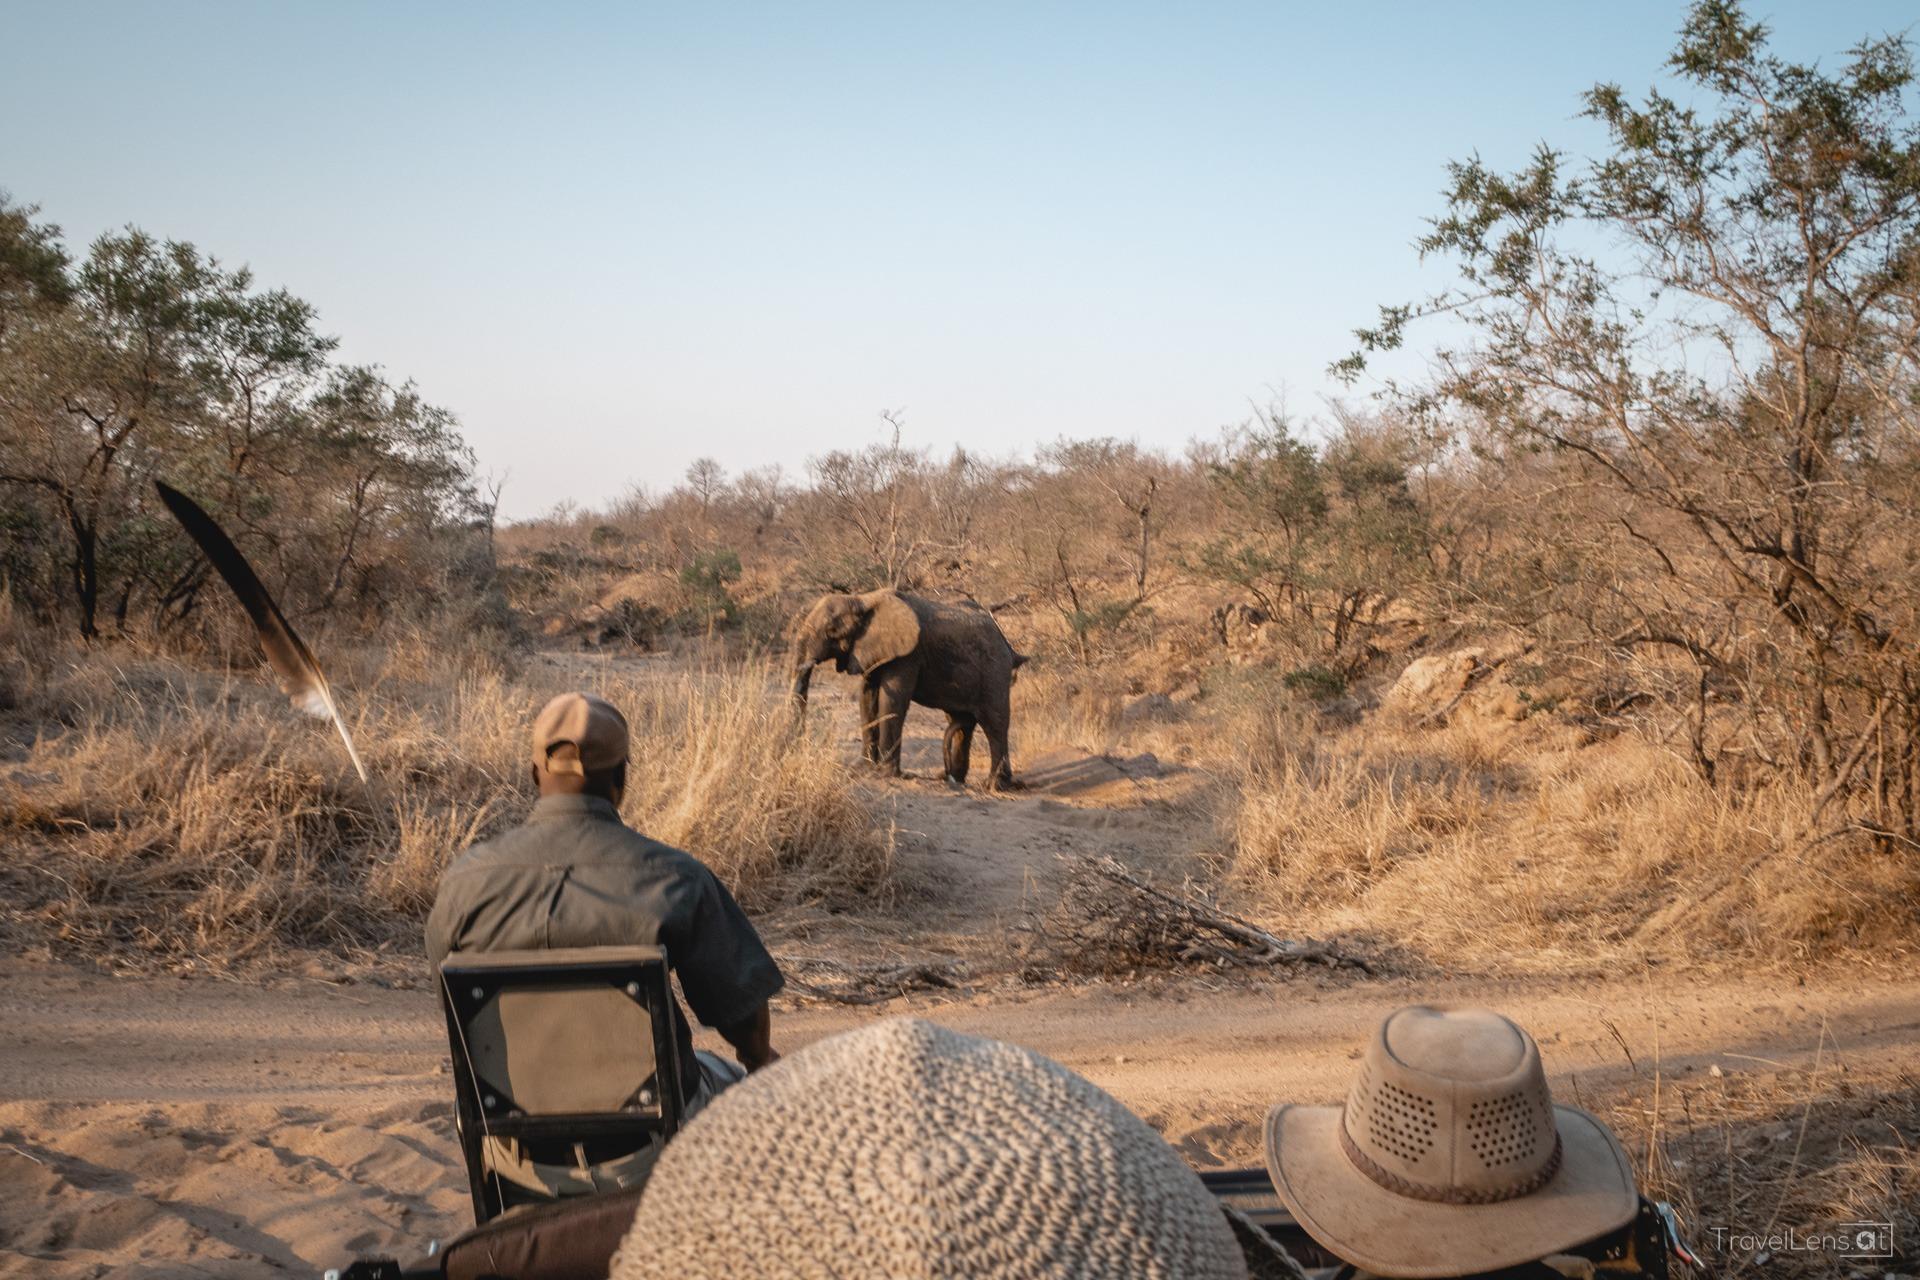 Südafrika Tag 4 – Safari am Weg ins Private Game Reserve (Teil 2)